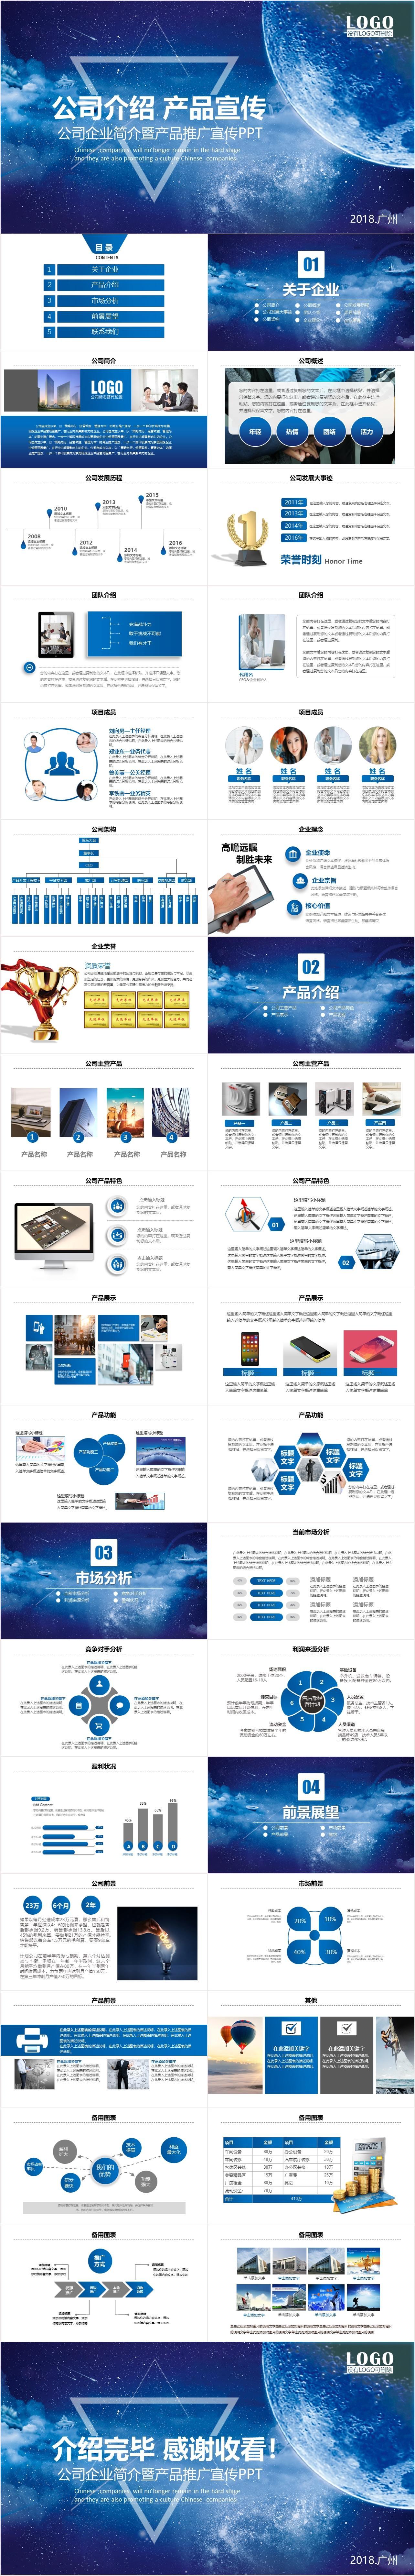 MD0048 公司企业简介暨产品推广宣传PPT模板